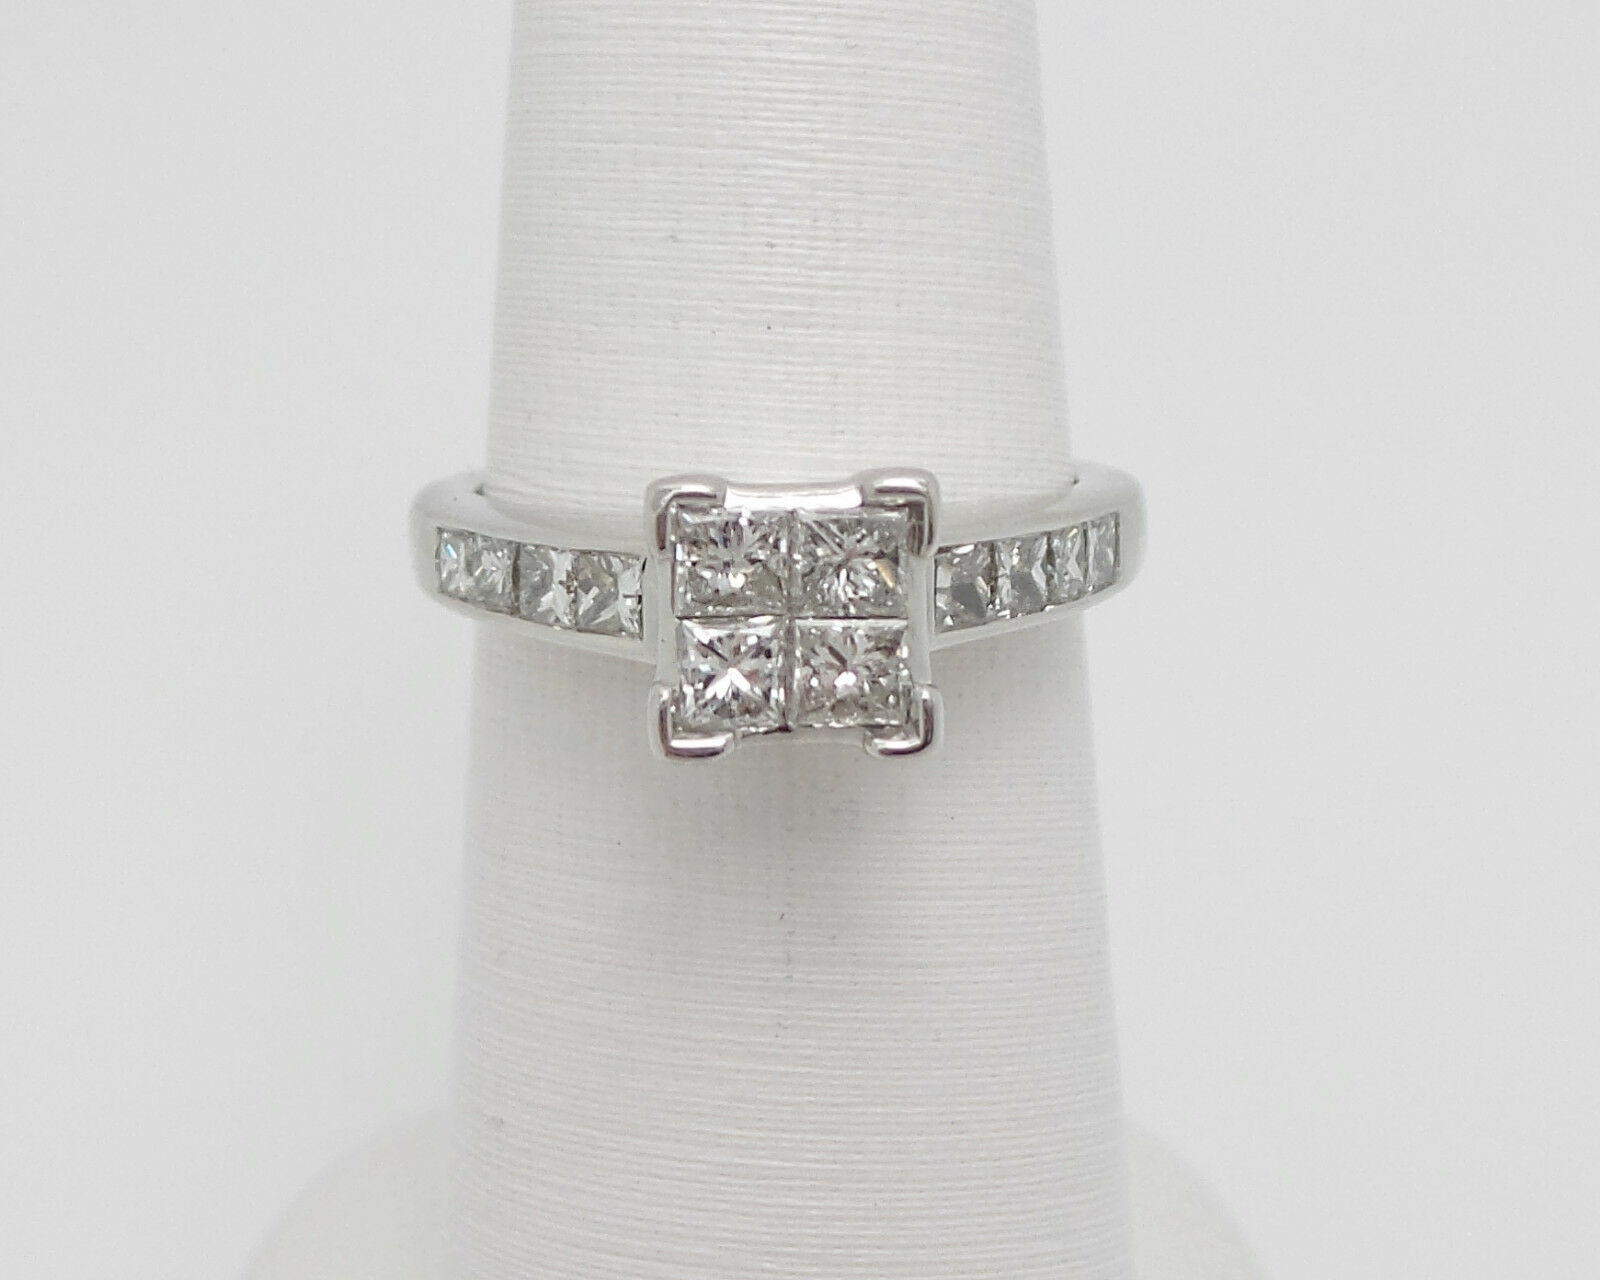 ZALES 1.50CT PRINCESS DIAMOND SOLITAIRE ENGAGEMENT WEDDING RING 14K WHITE gold